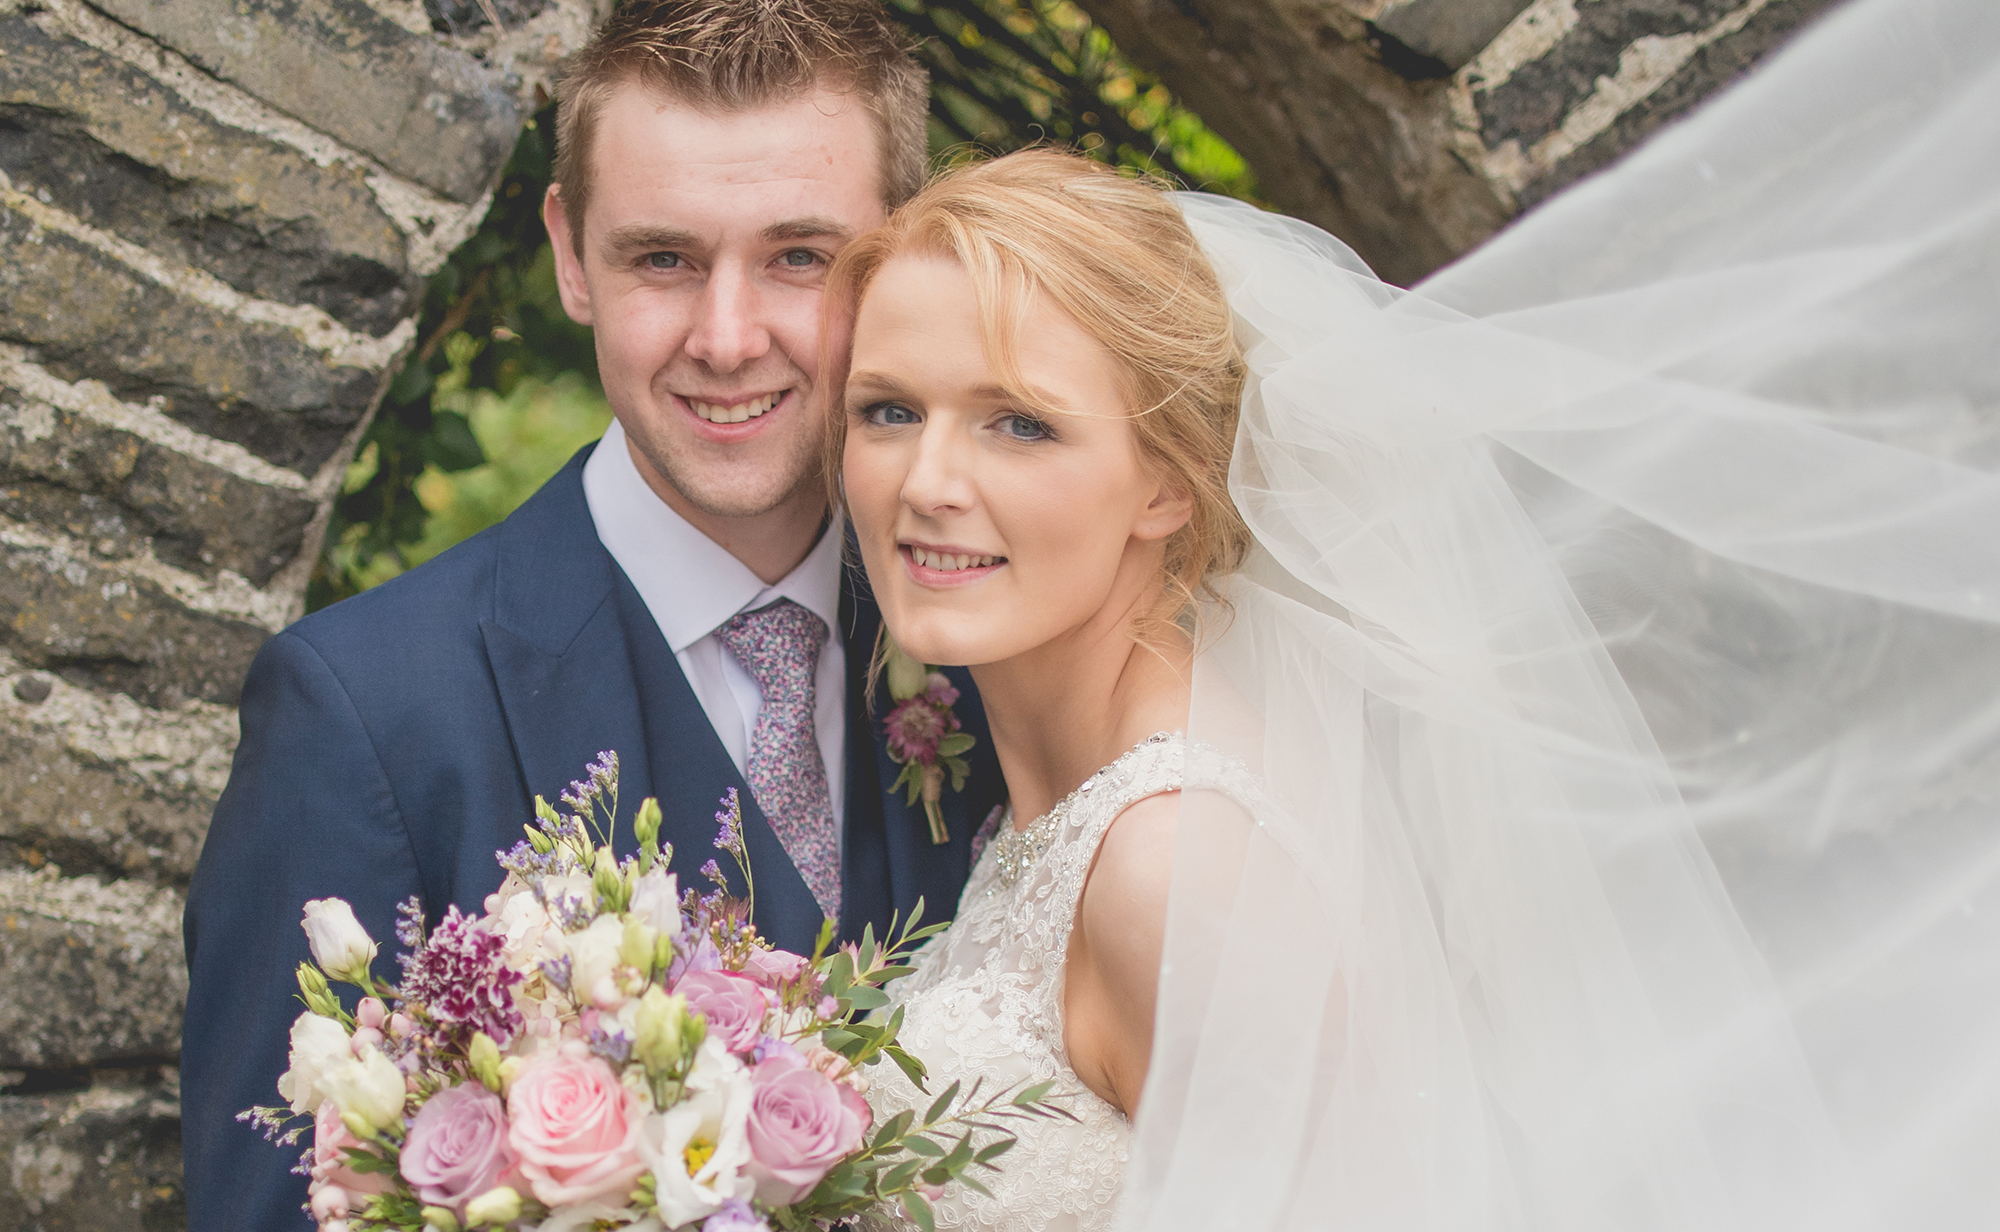 ballygally wedding photography tc photography larne belfast lisburn 3